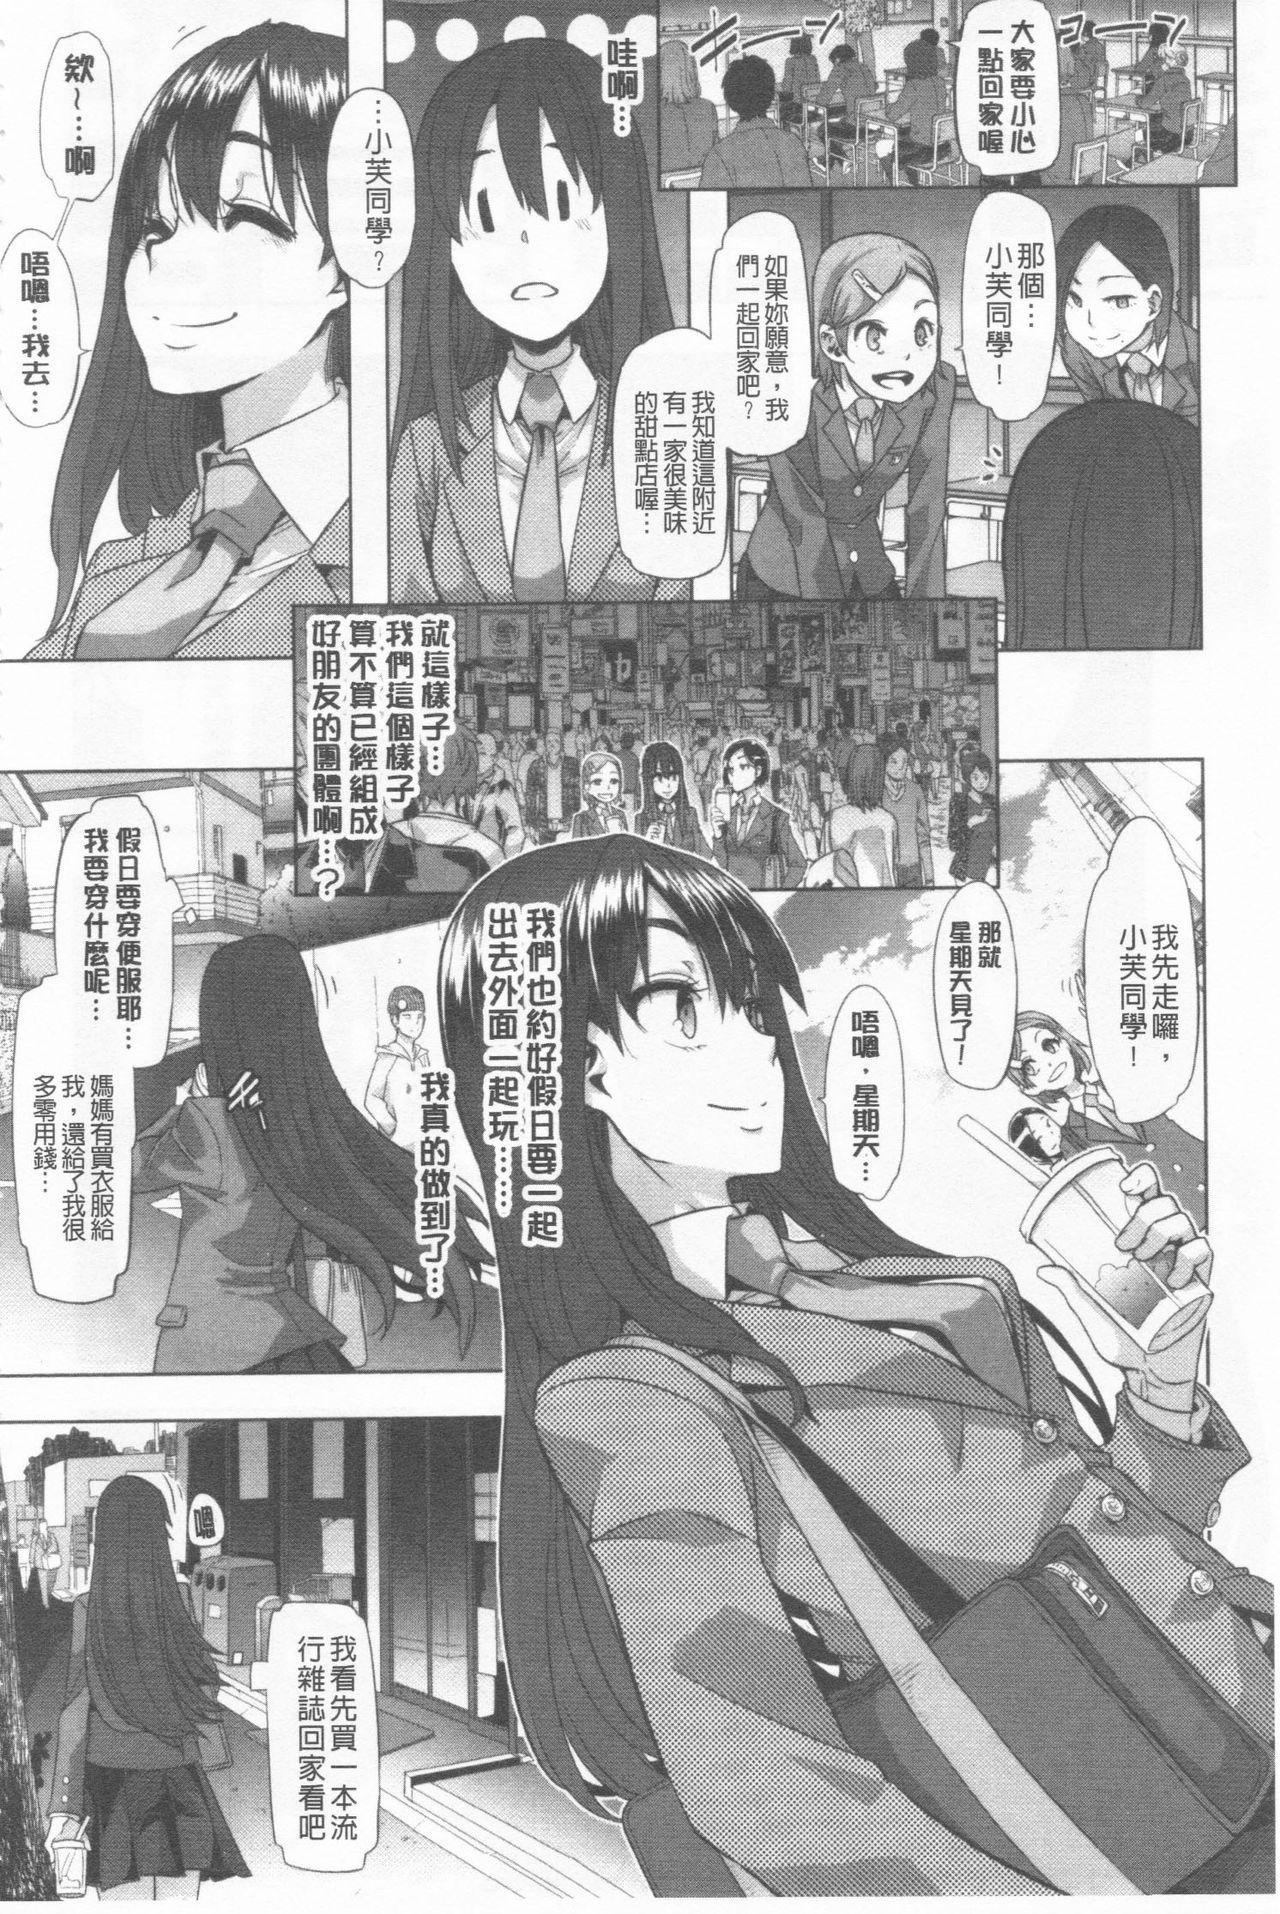 Henshin + 4P leaflet 10